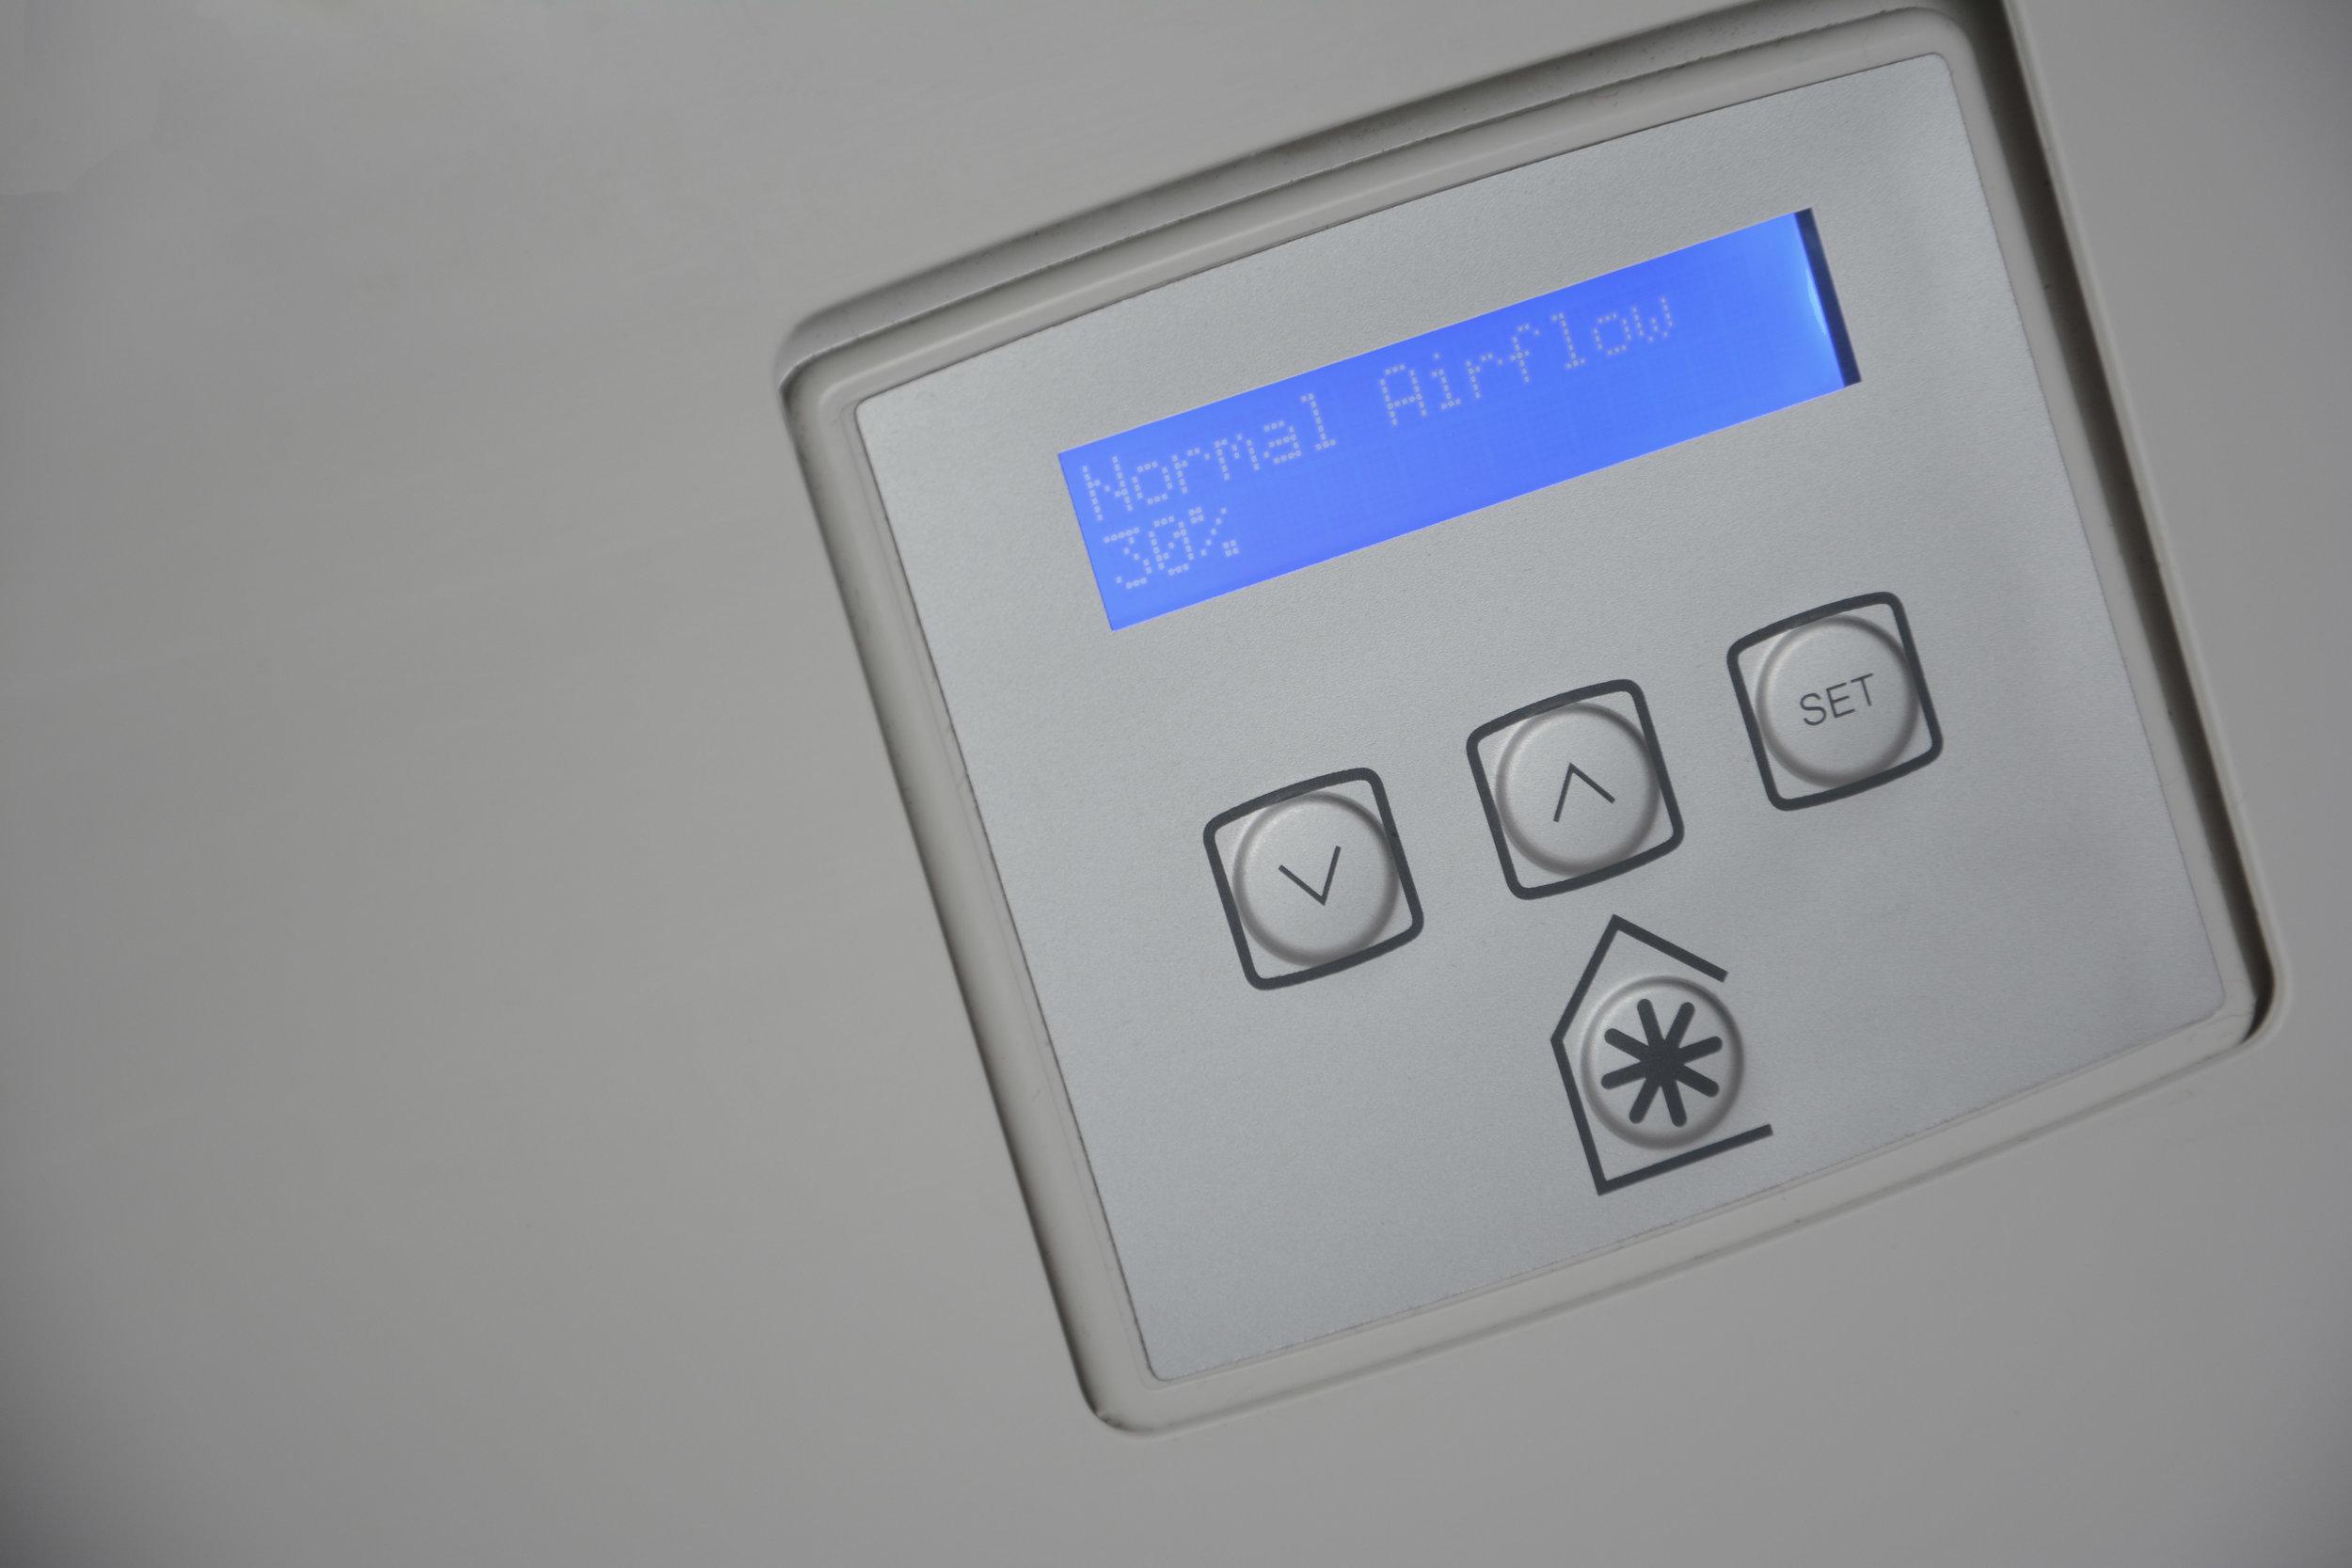 MVHR control panel